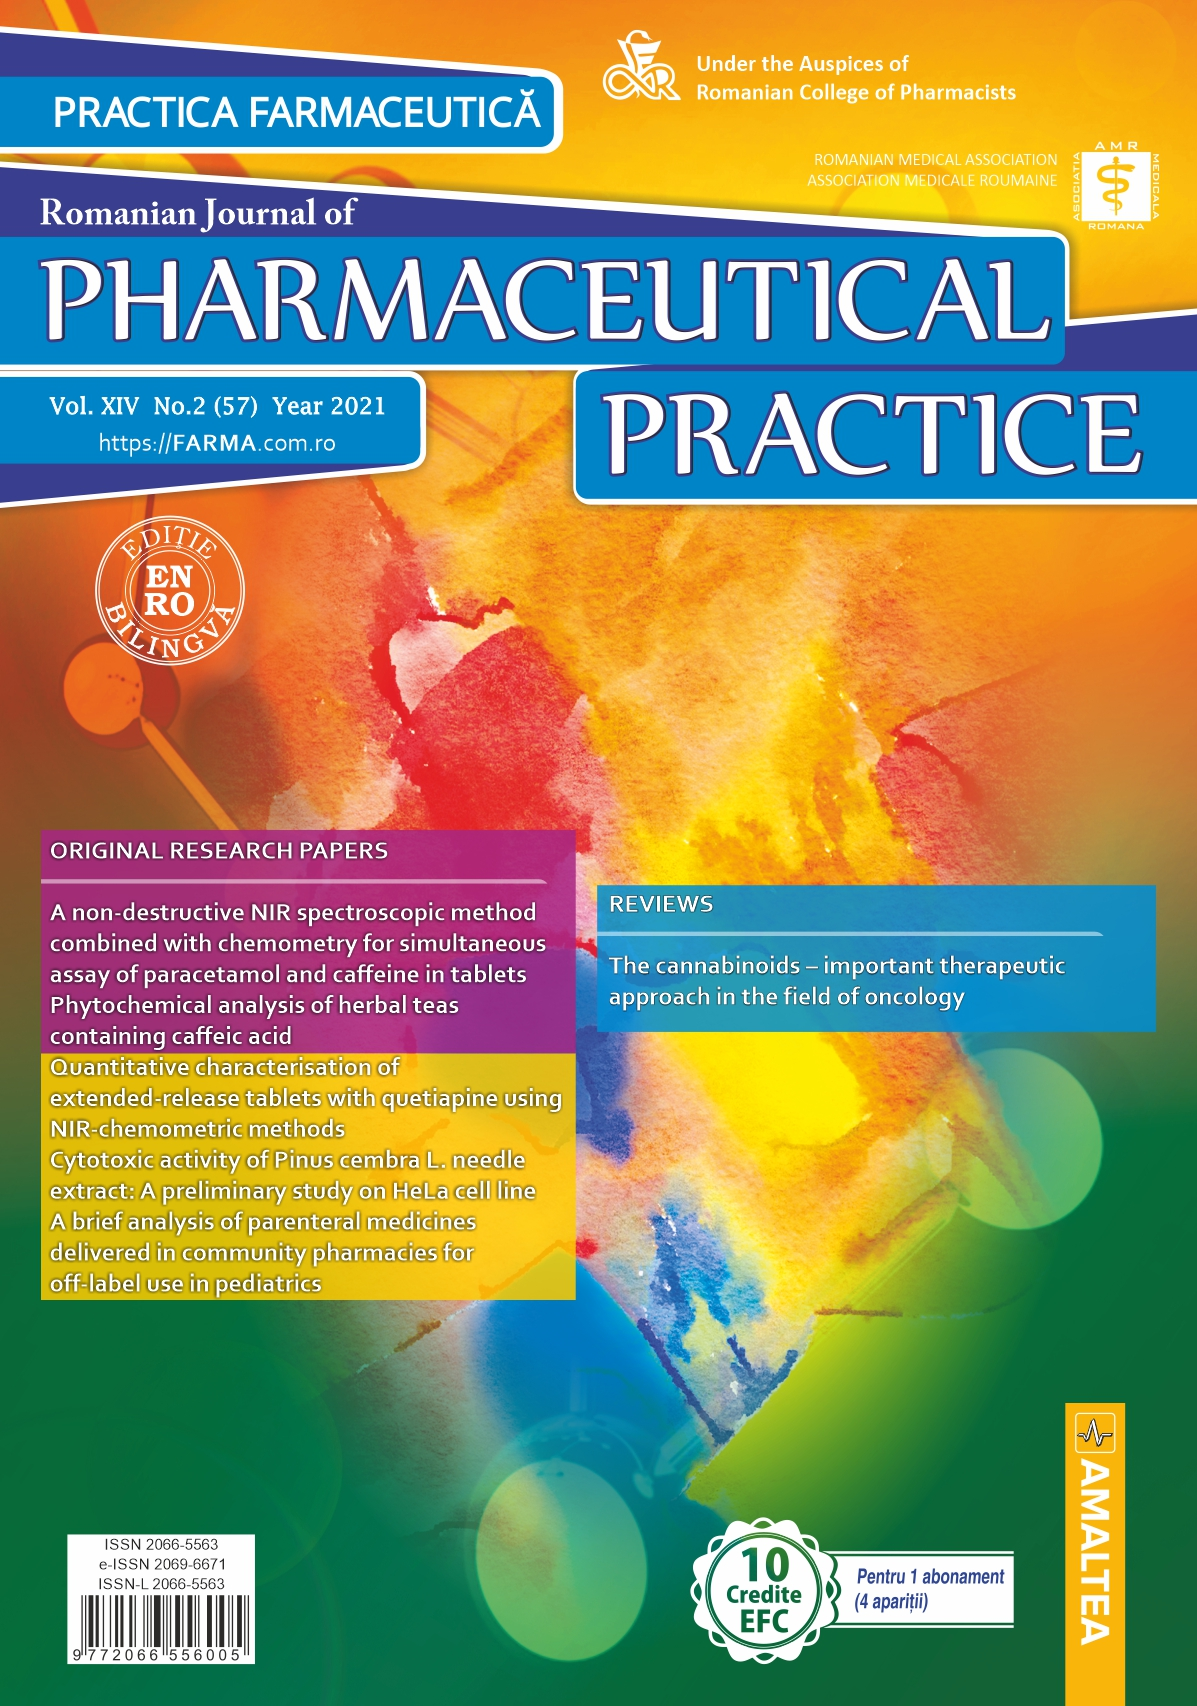 Romanian Journal of Pharmaceutical Practice - Practica Farmaceutica, Vol. XIV, No. 2 (57), 2021